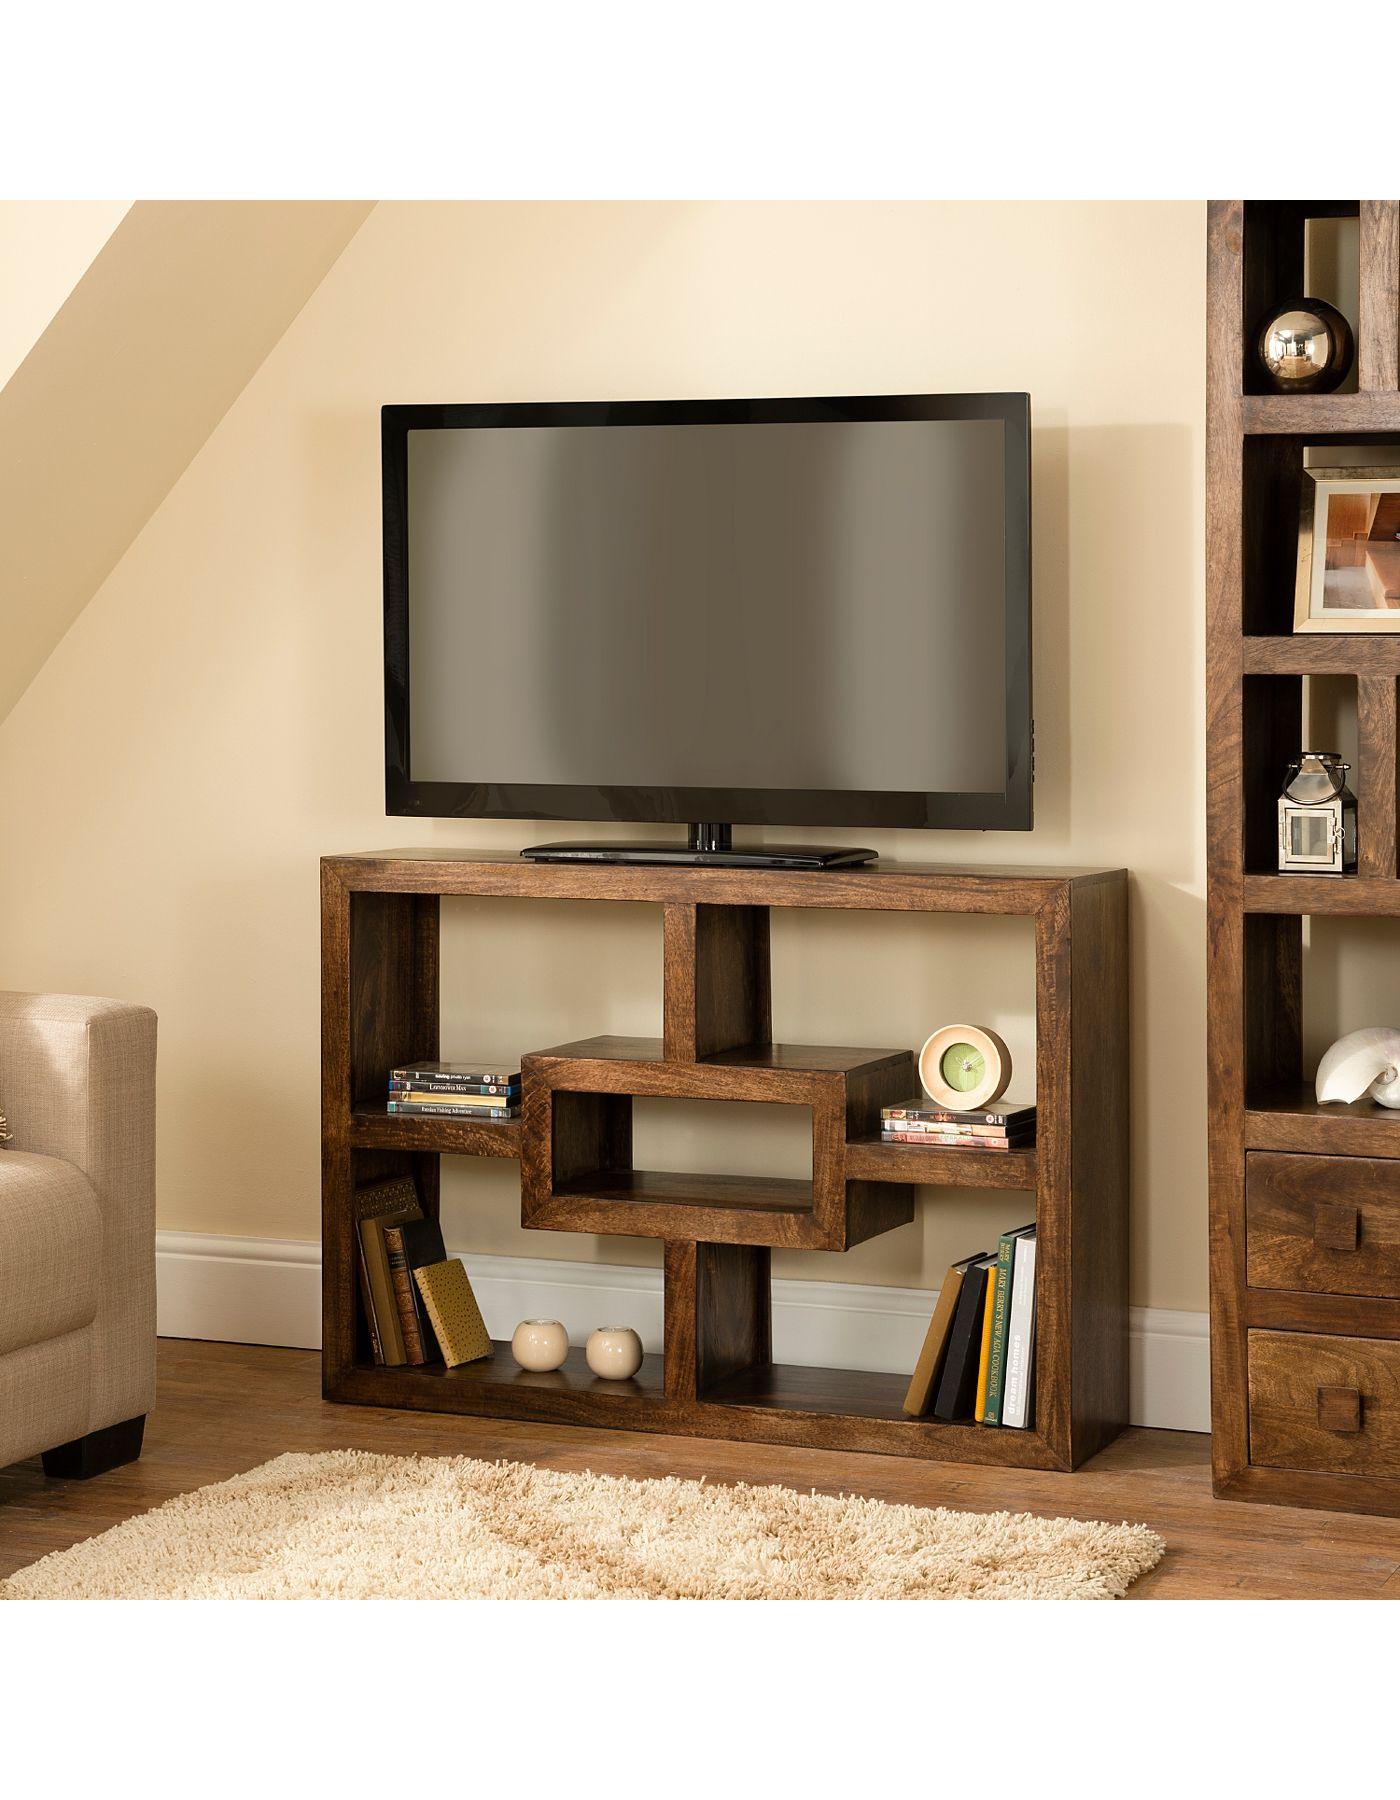 Kochi Tv Shelf Entertainment Unit Tv Units Asda Direct Draft  # Post Television En Bois